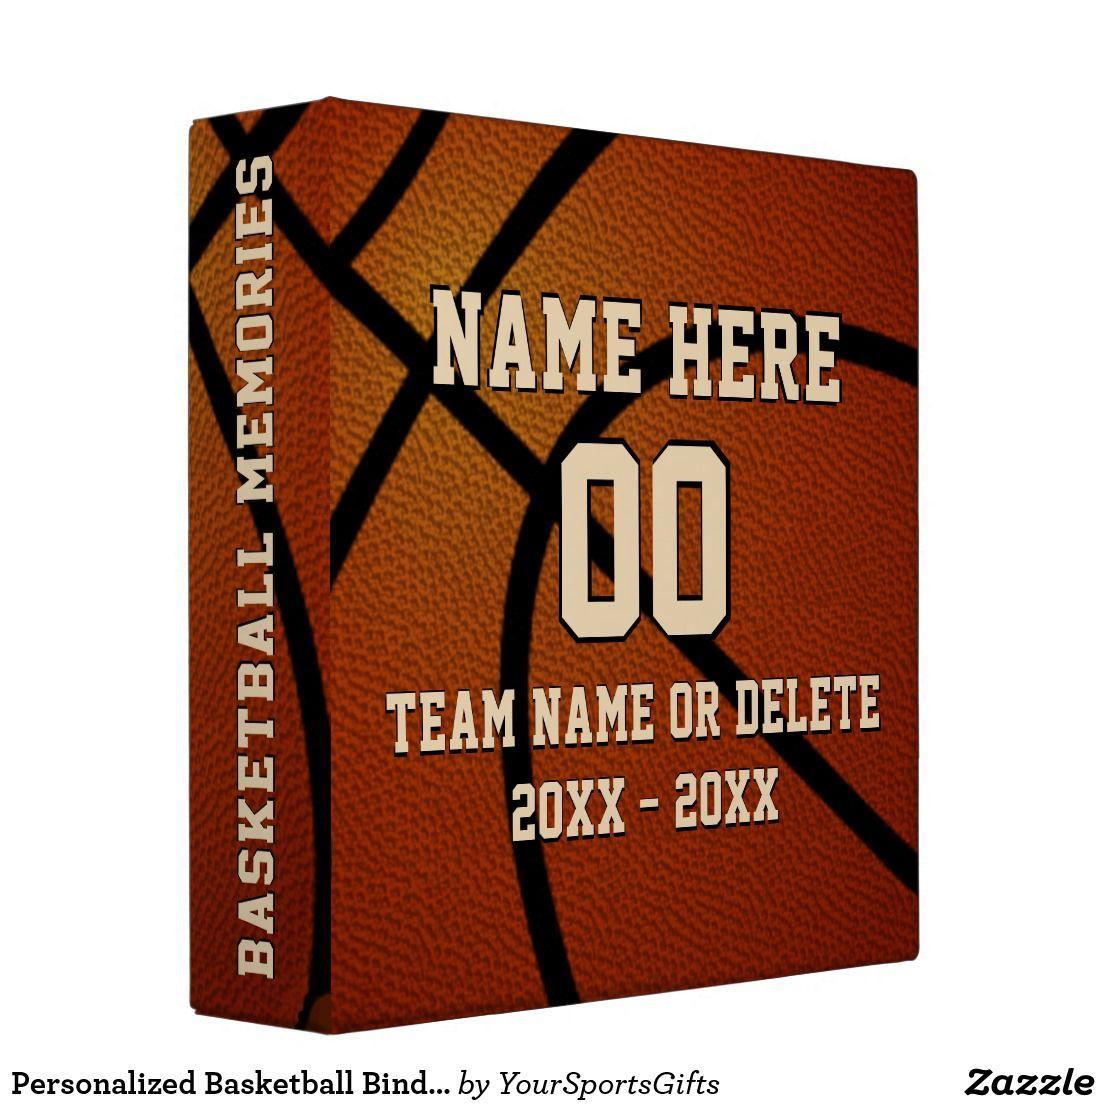 Personalized Basketball Binder, Memories Or Card 3 Ring